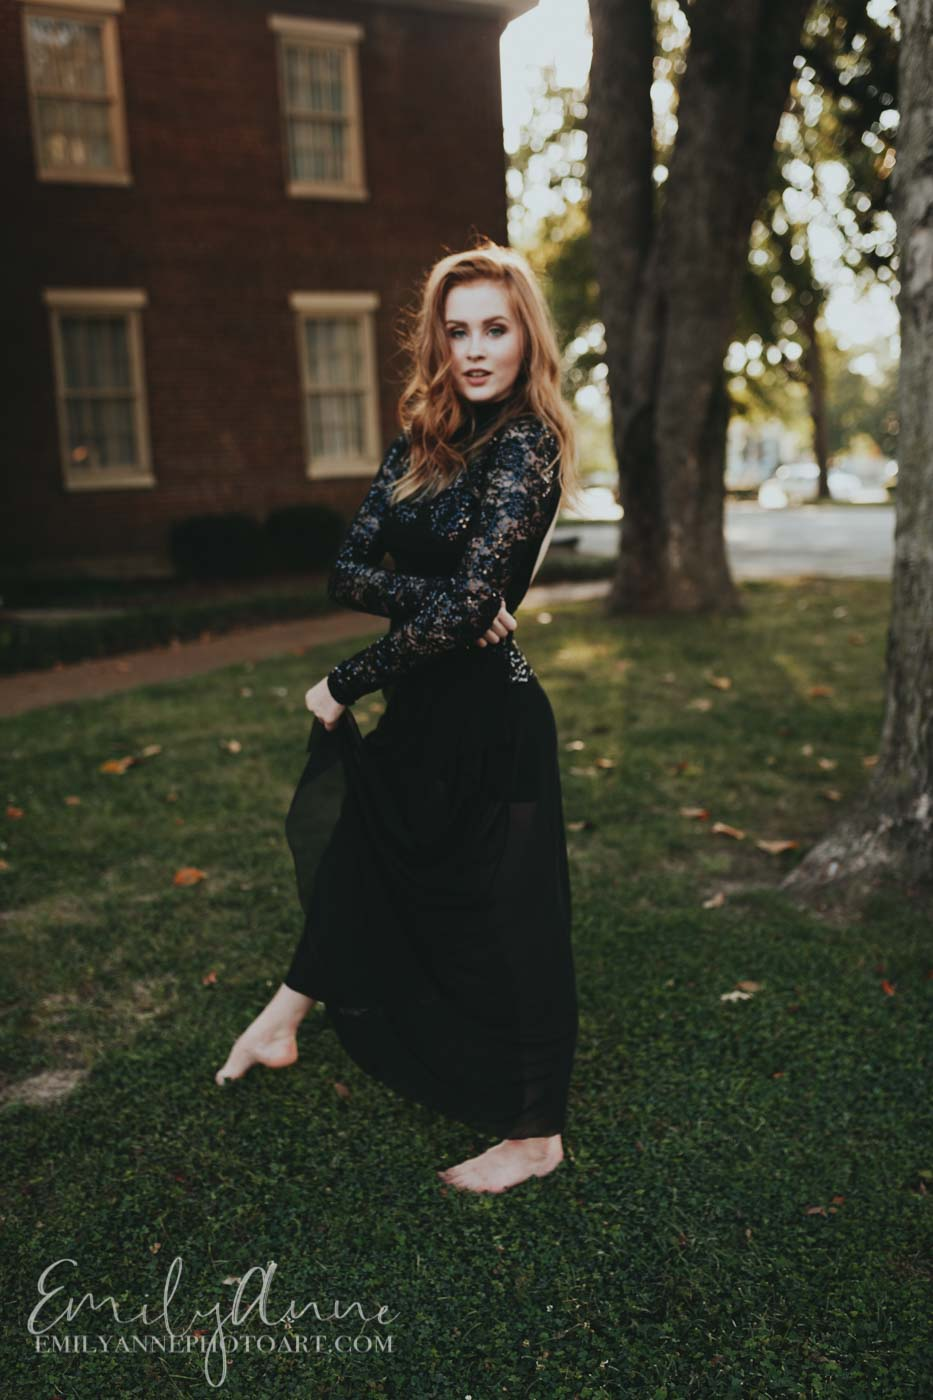 epic dance photography by Emily Anne photo art Nashville TN